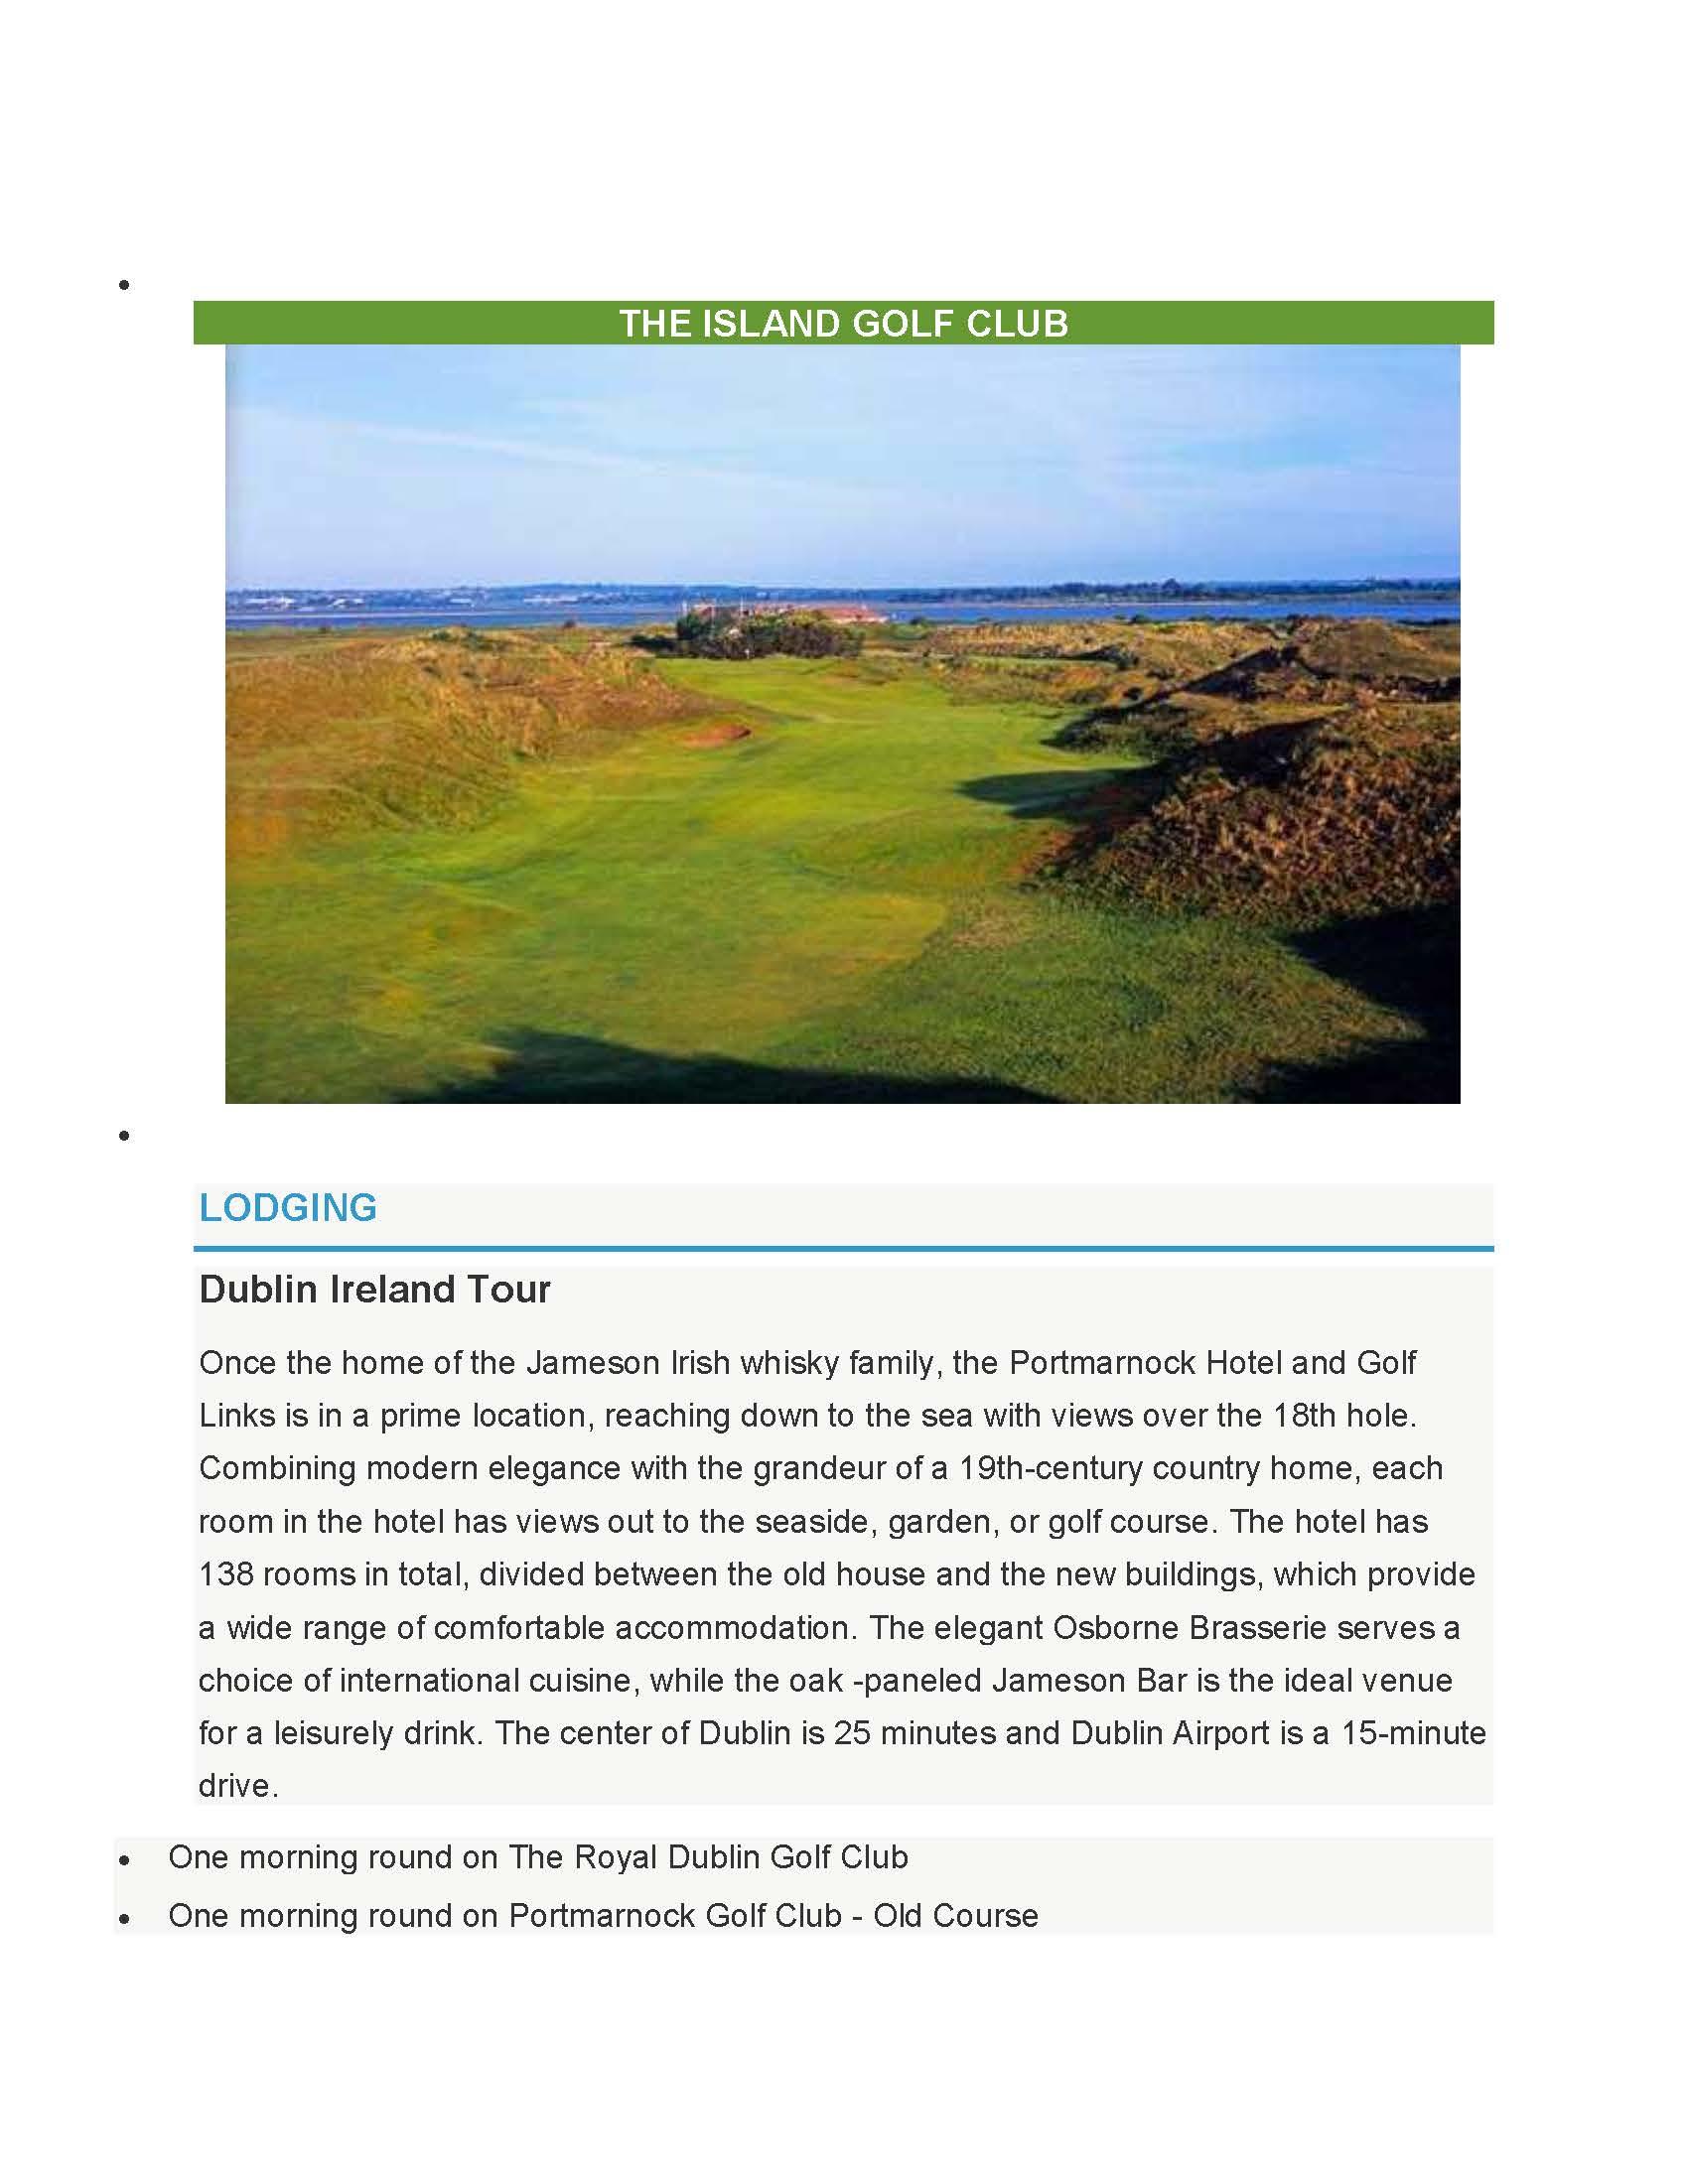 Dublin Ireland Tour Golf Edited_Page_3.jpg